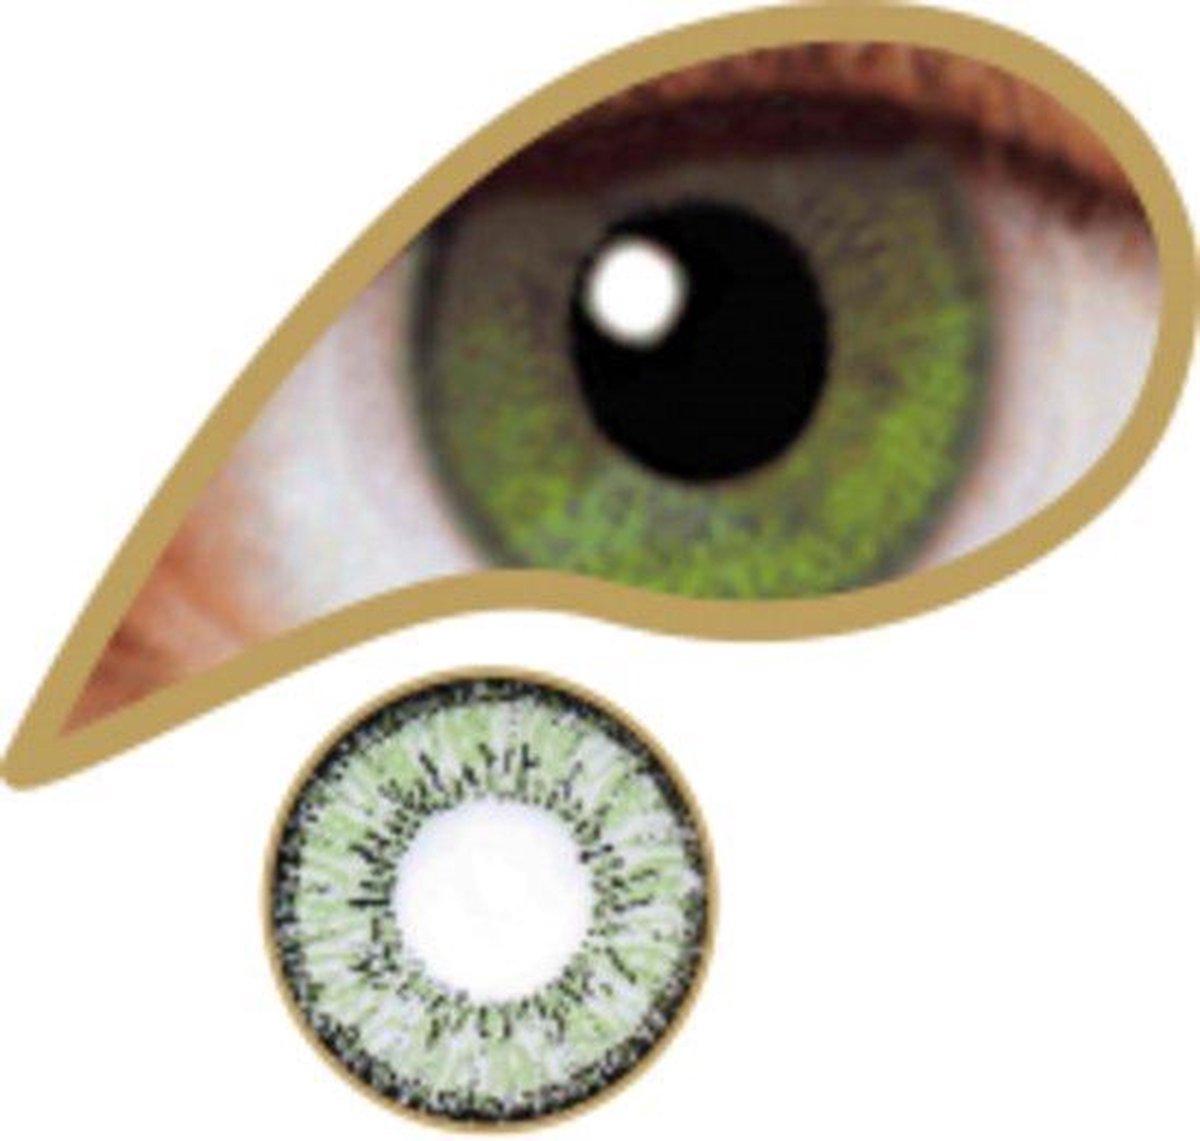 MesmerEyez - Coral Green - Green - Olive Green - 1 dag lens - MesmerEyez